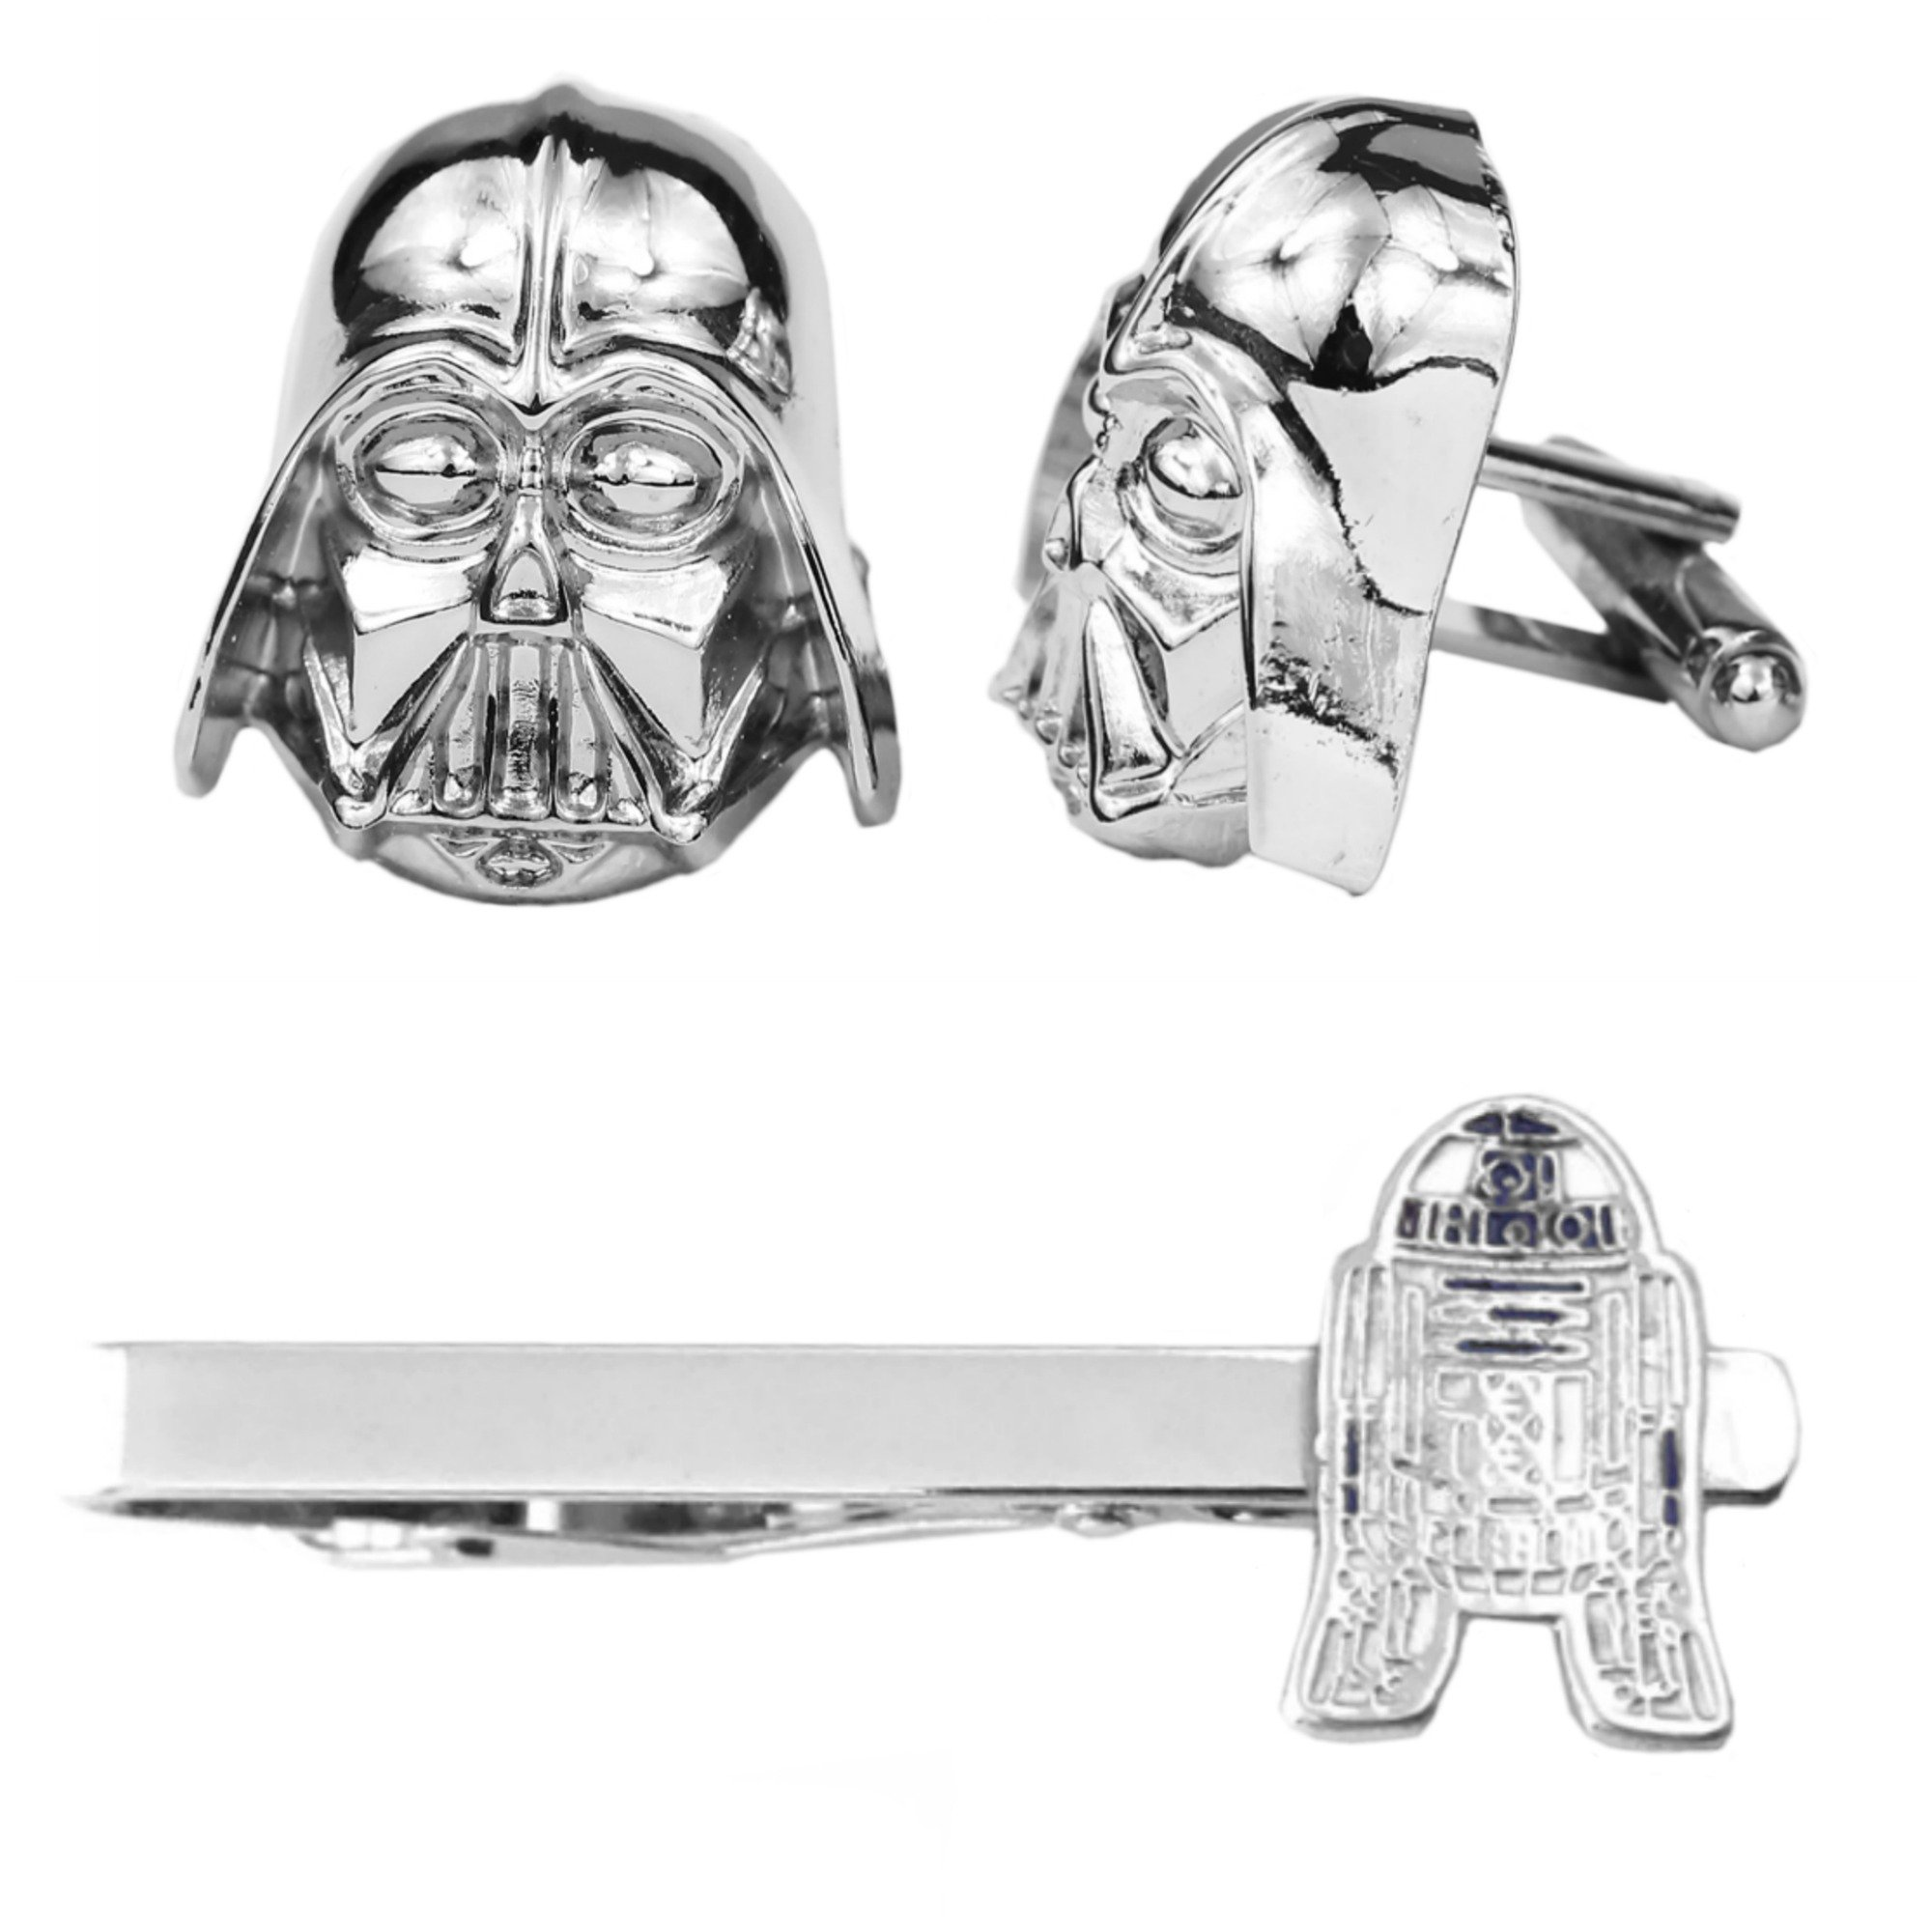 Outlander Darth Vader Silver Cufflink & R2-D2 Tiebar - New 2018 Star Wars Movies - Set of 2 Wedding Logo w/Gift Box